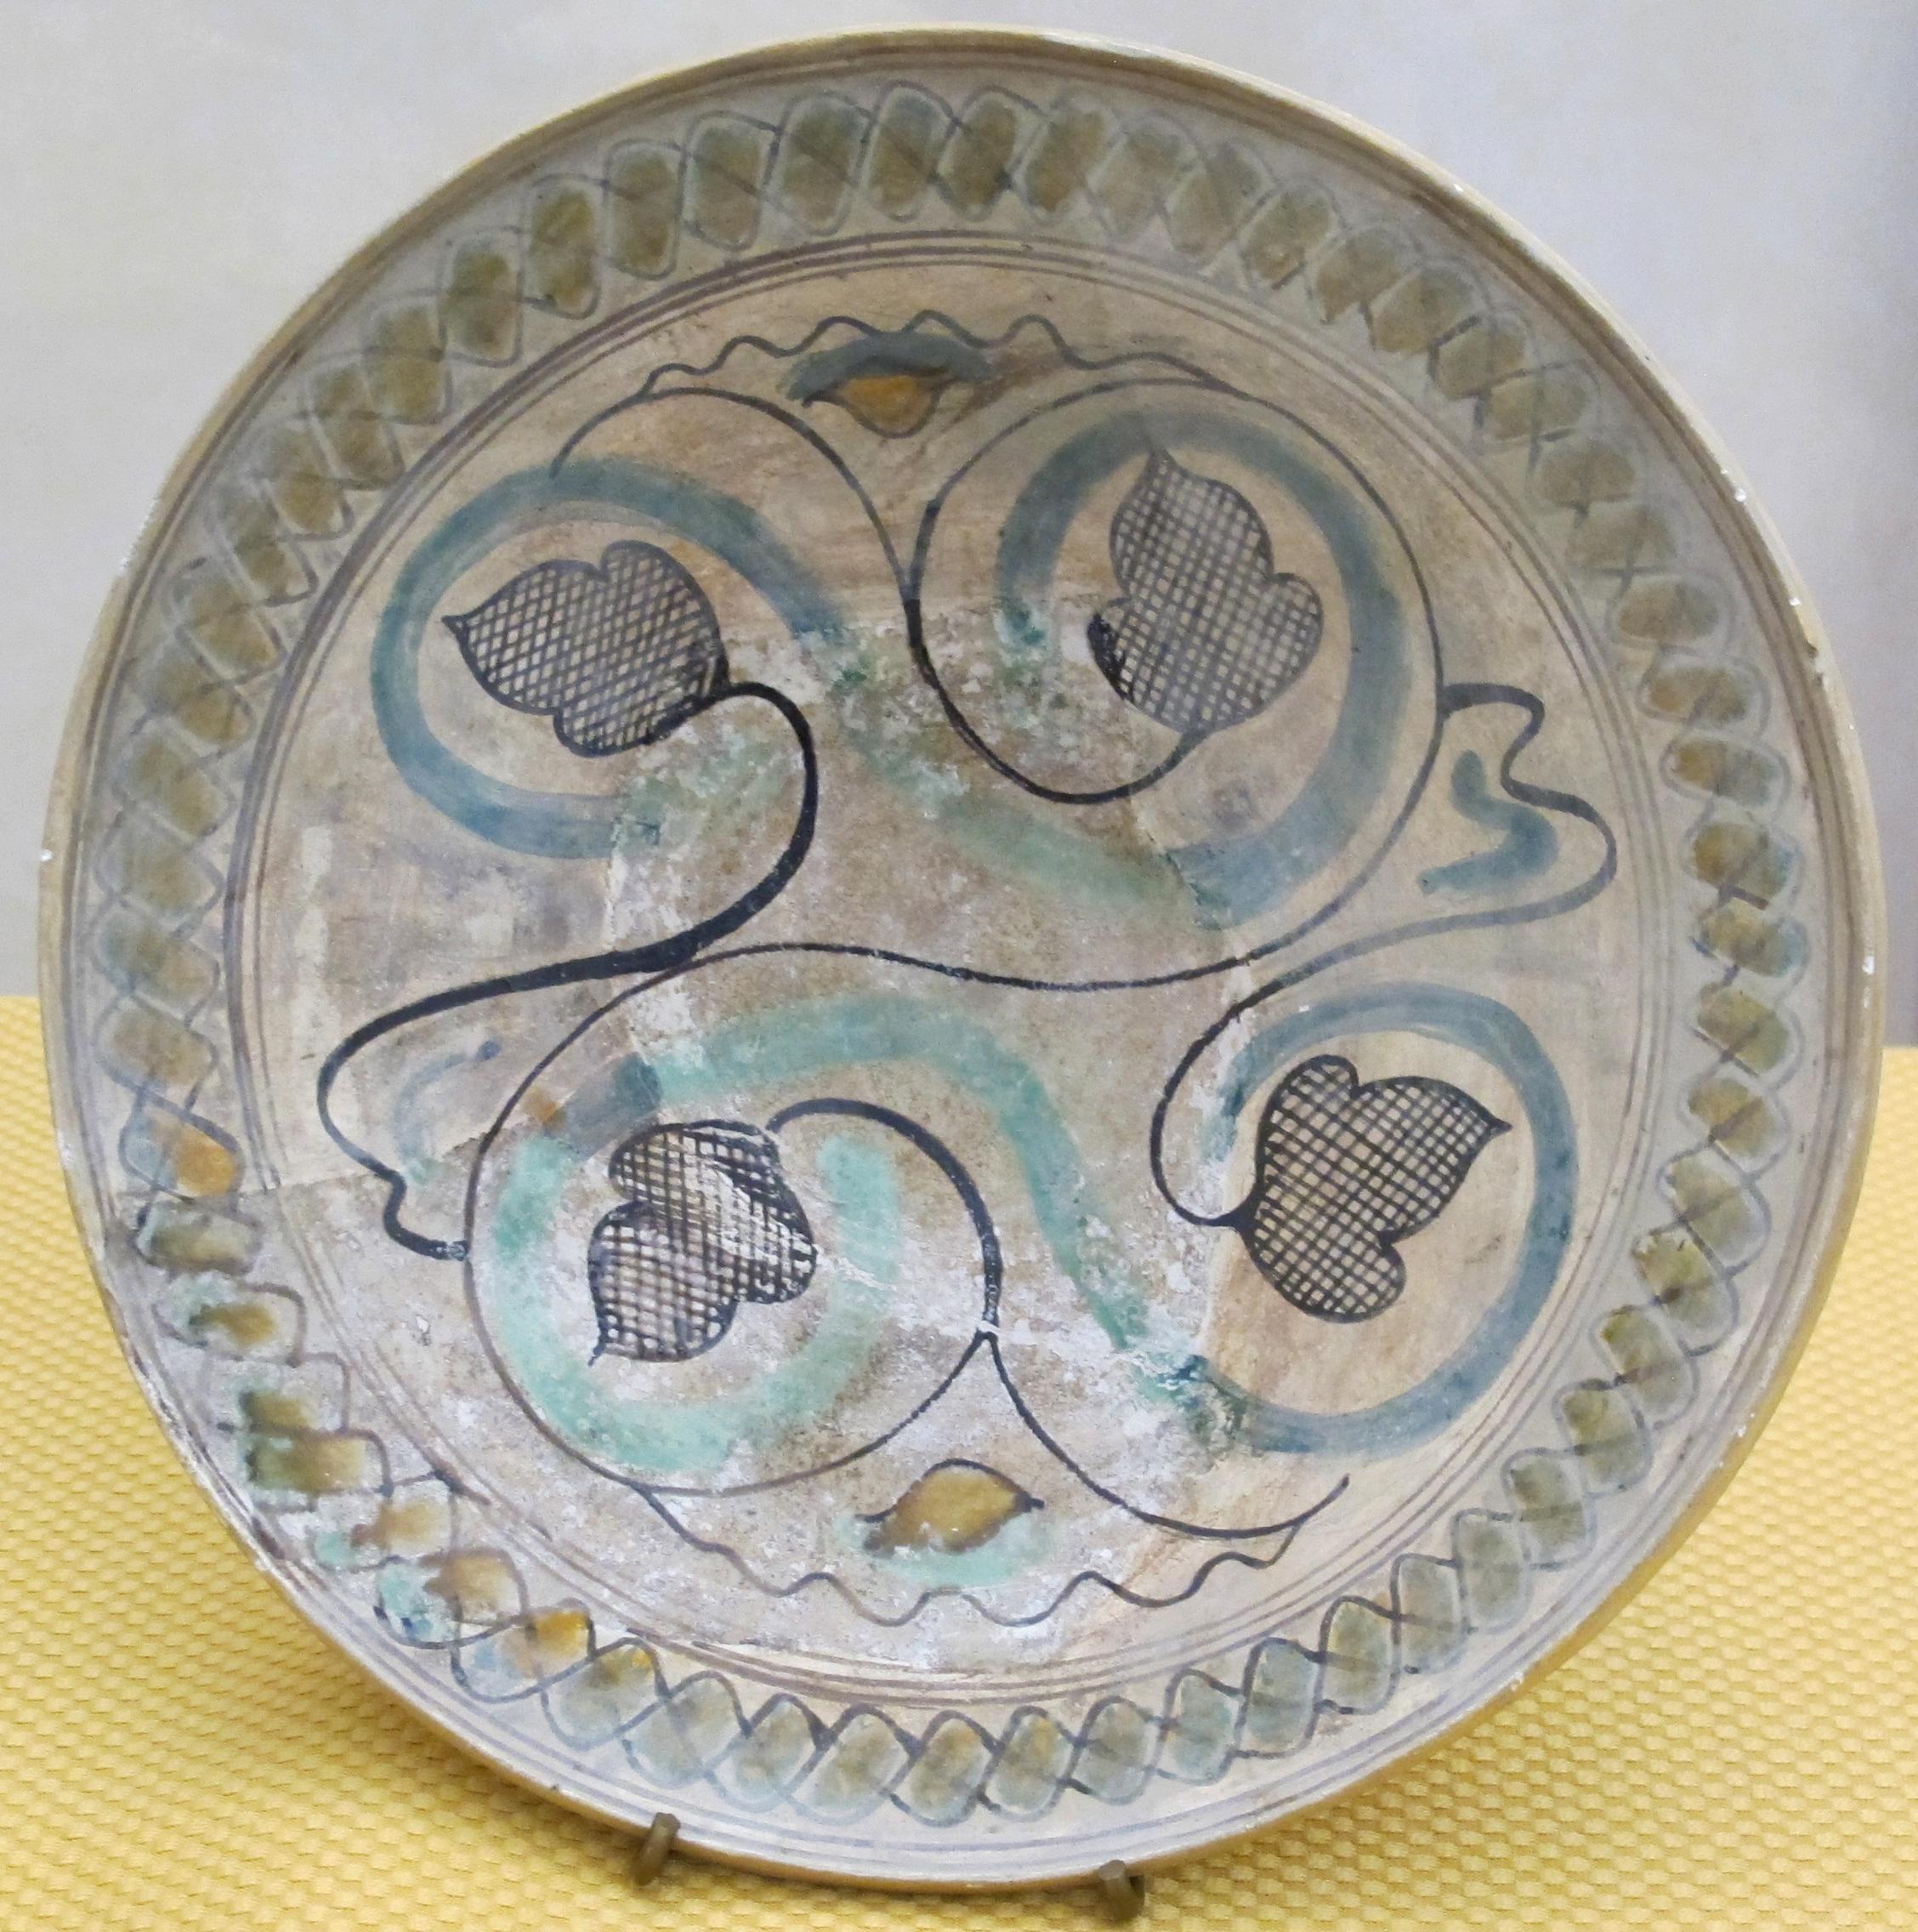 Ceramiche di caltagirone online dating